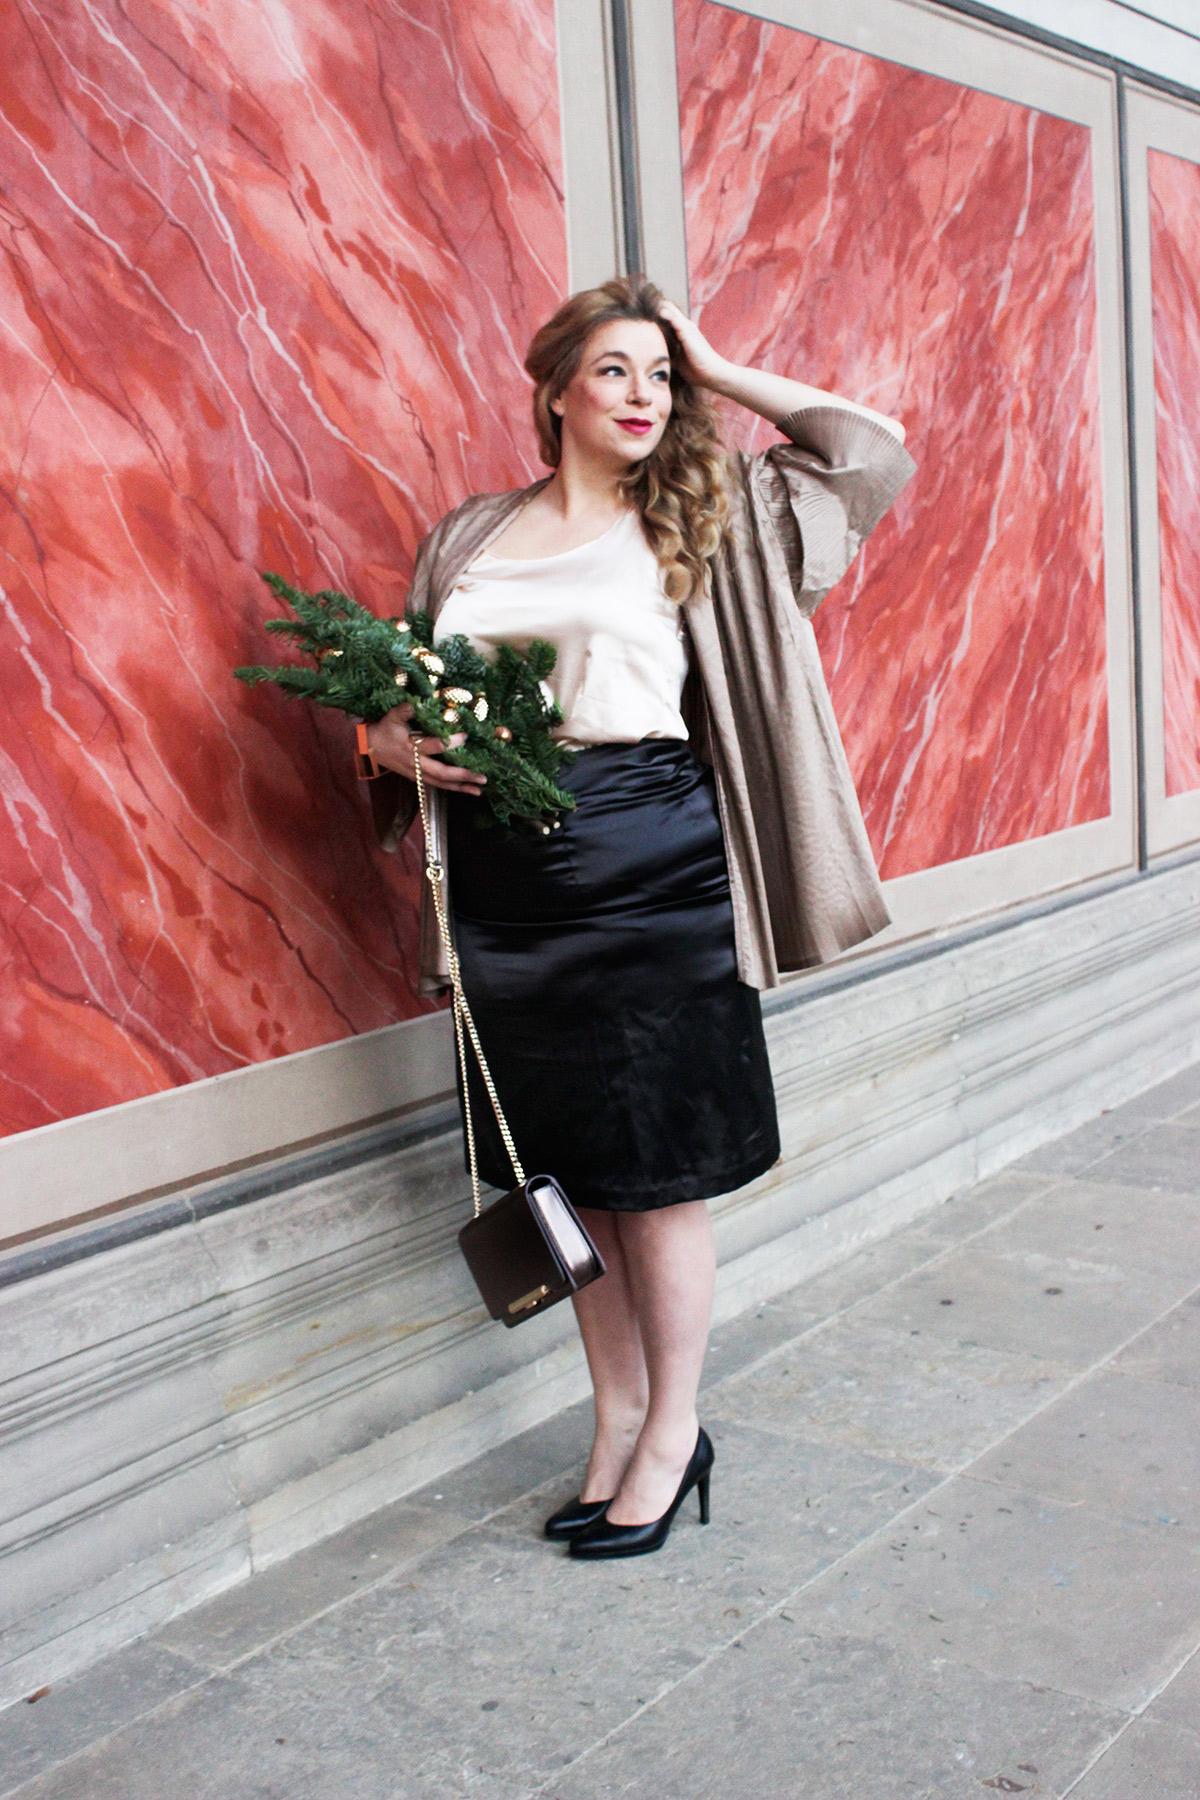 SabineAllamoda-Megabambi-Caterinapogorzelski-plussizemodel-Plussizeblogger-peterKaiser